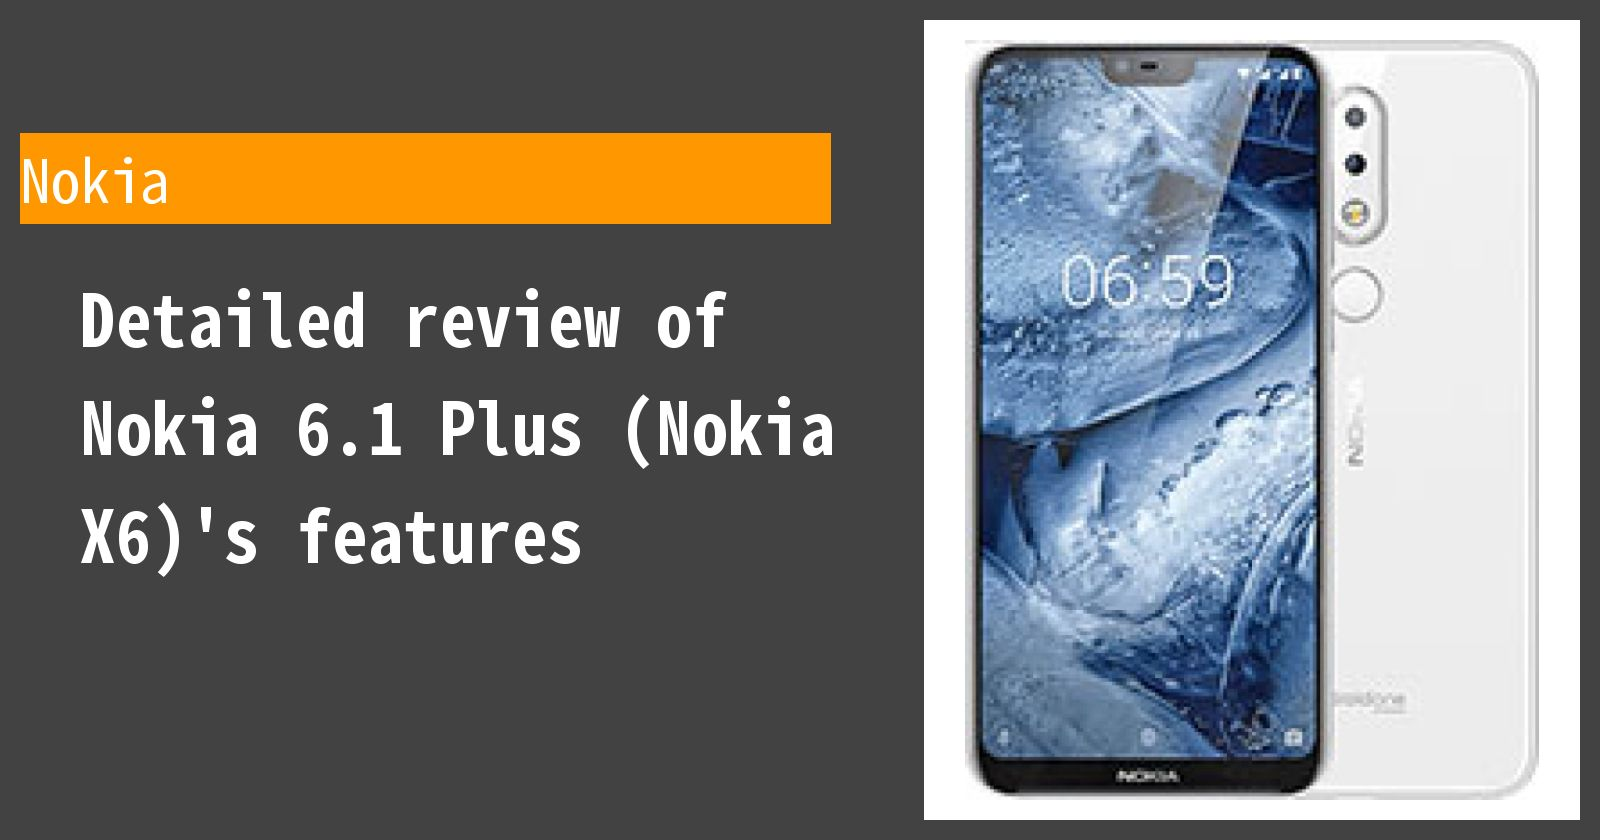 Detailed review of Nokia 6.1 Plus (Nokia X6)'s features